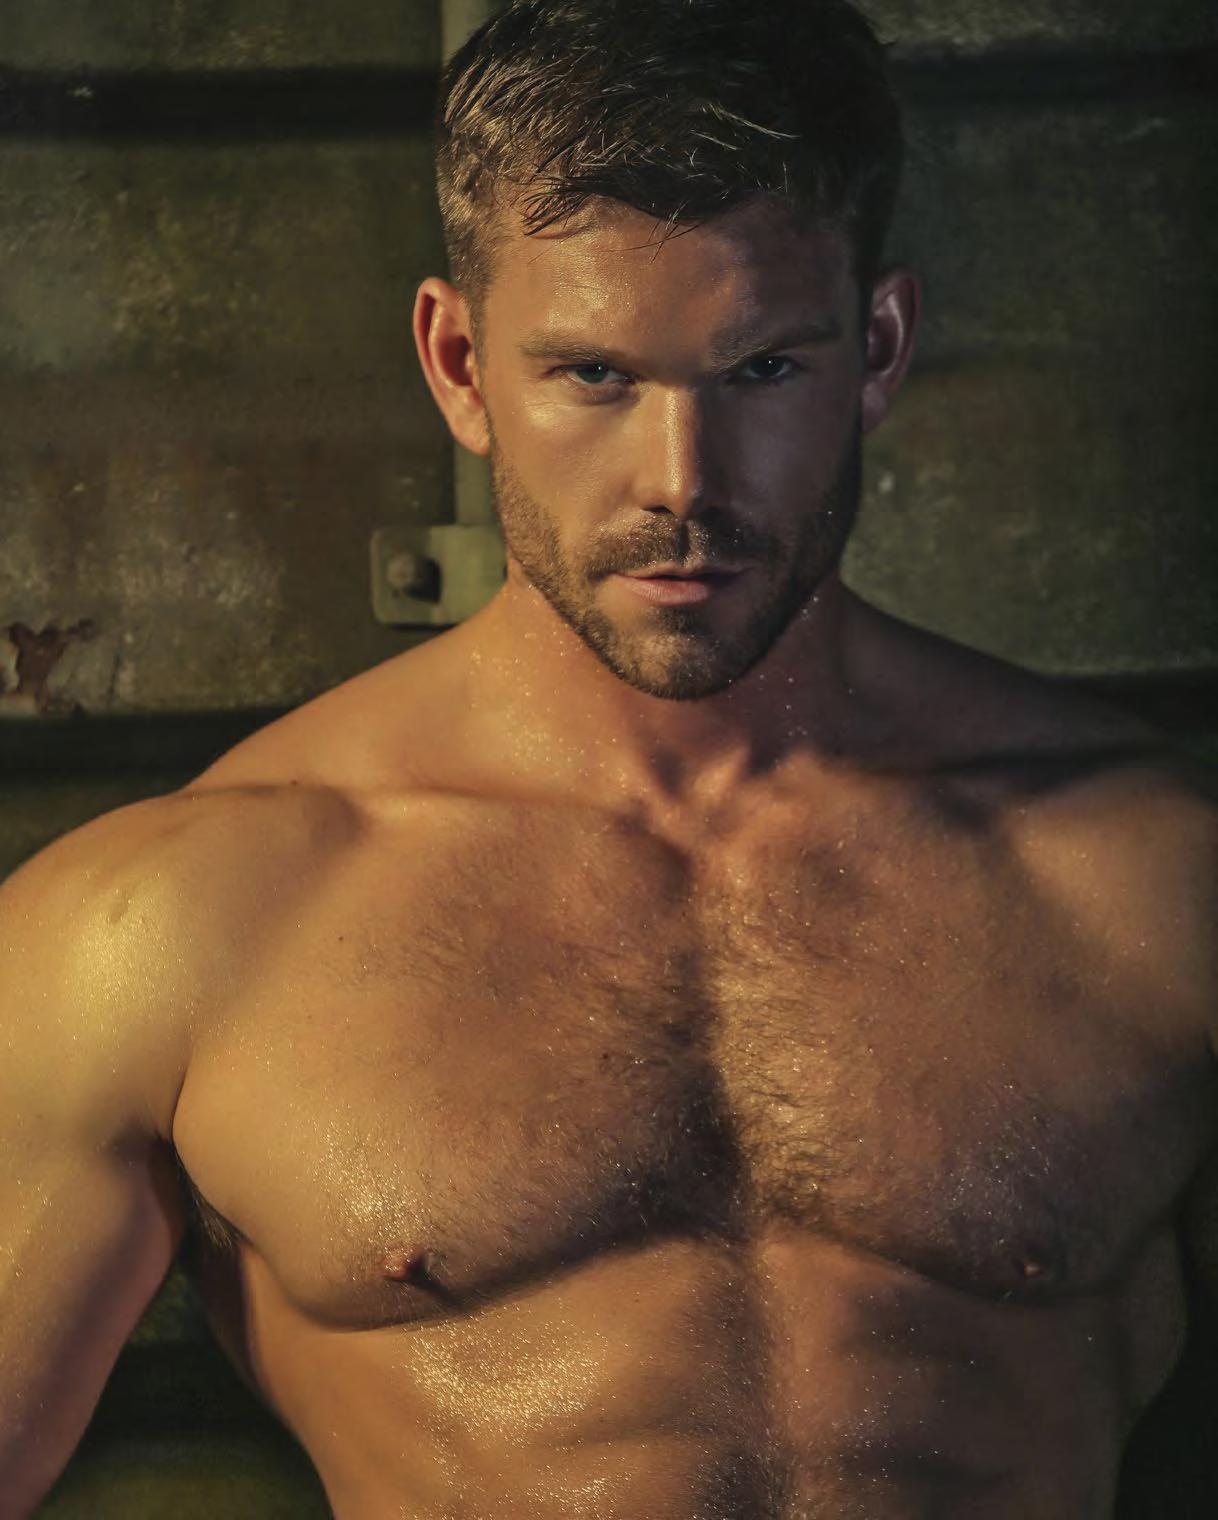 Naked pics of kevin mcdaid, gremlin gay twink gallery